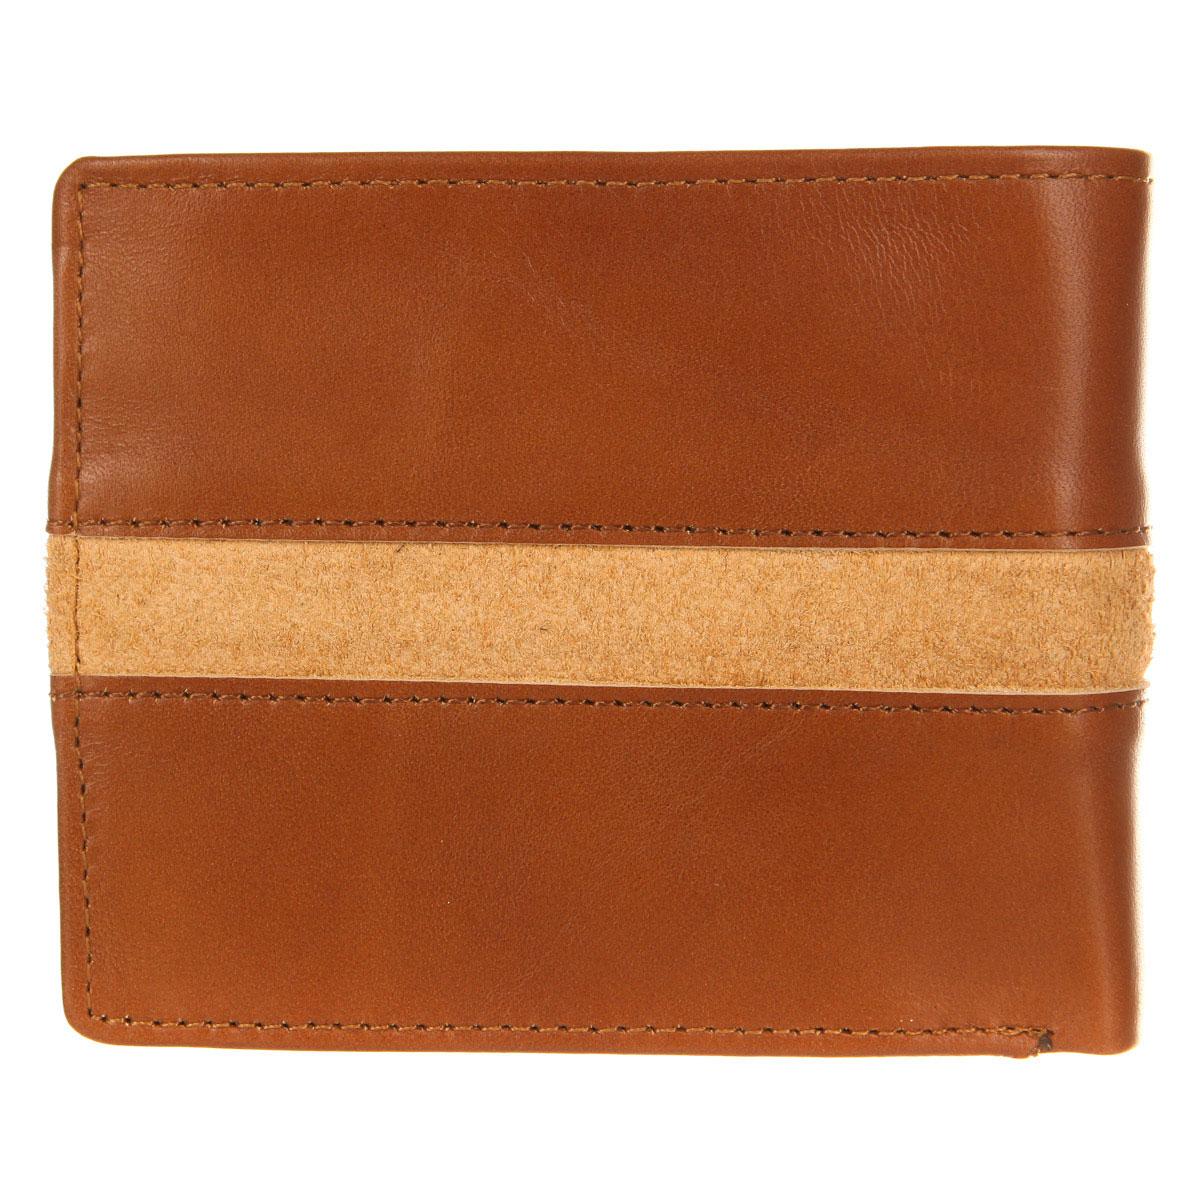 Мужской кошелек Billabong Dbah Leather Tan